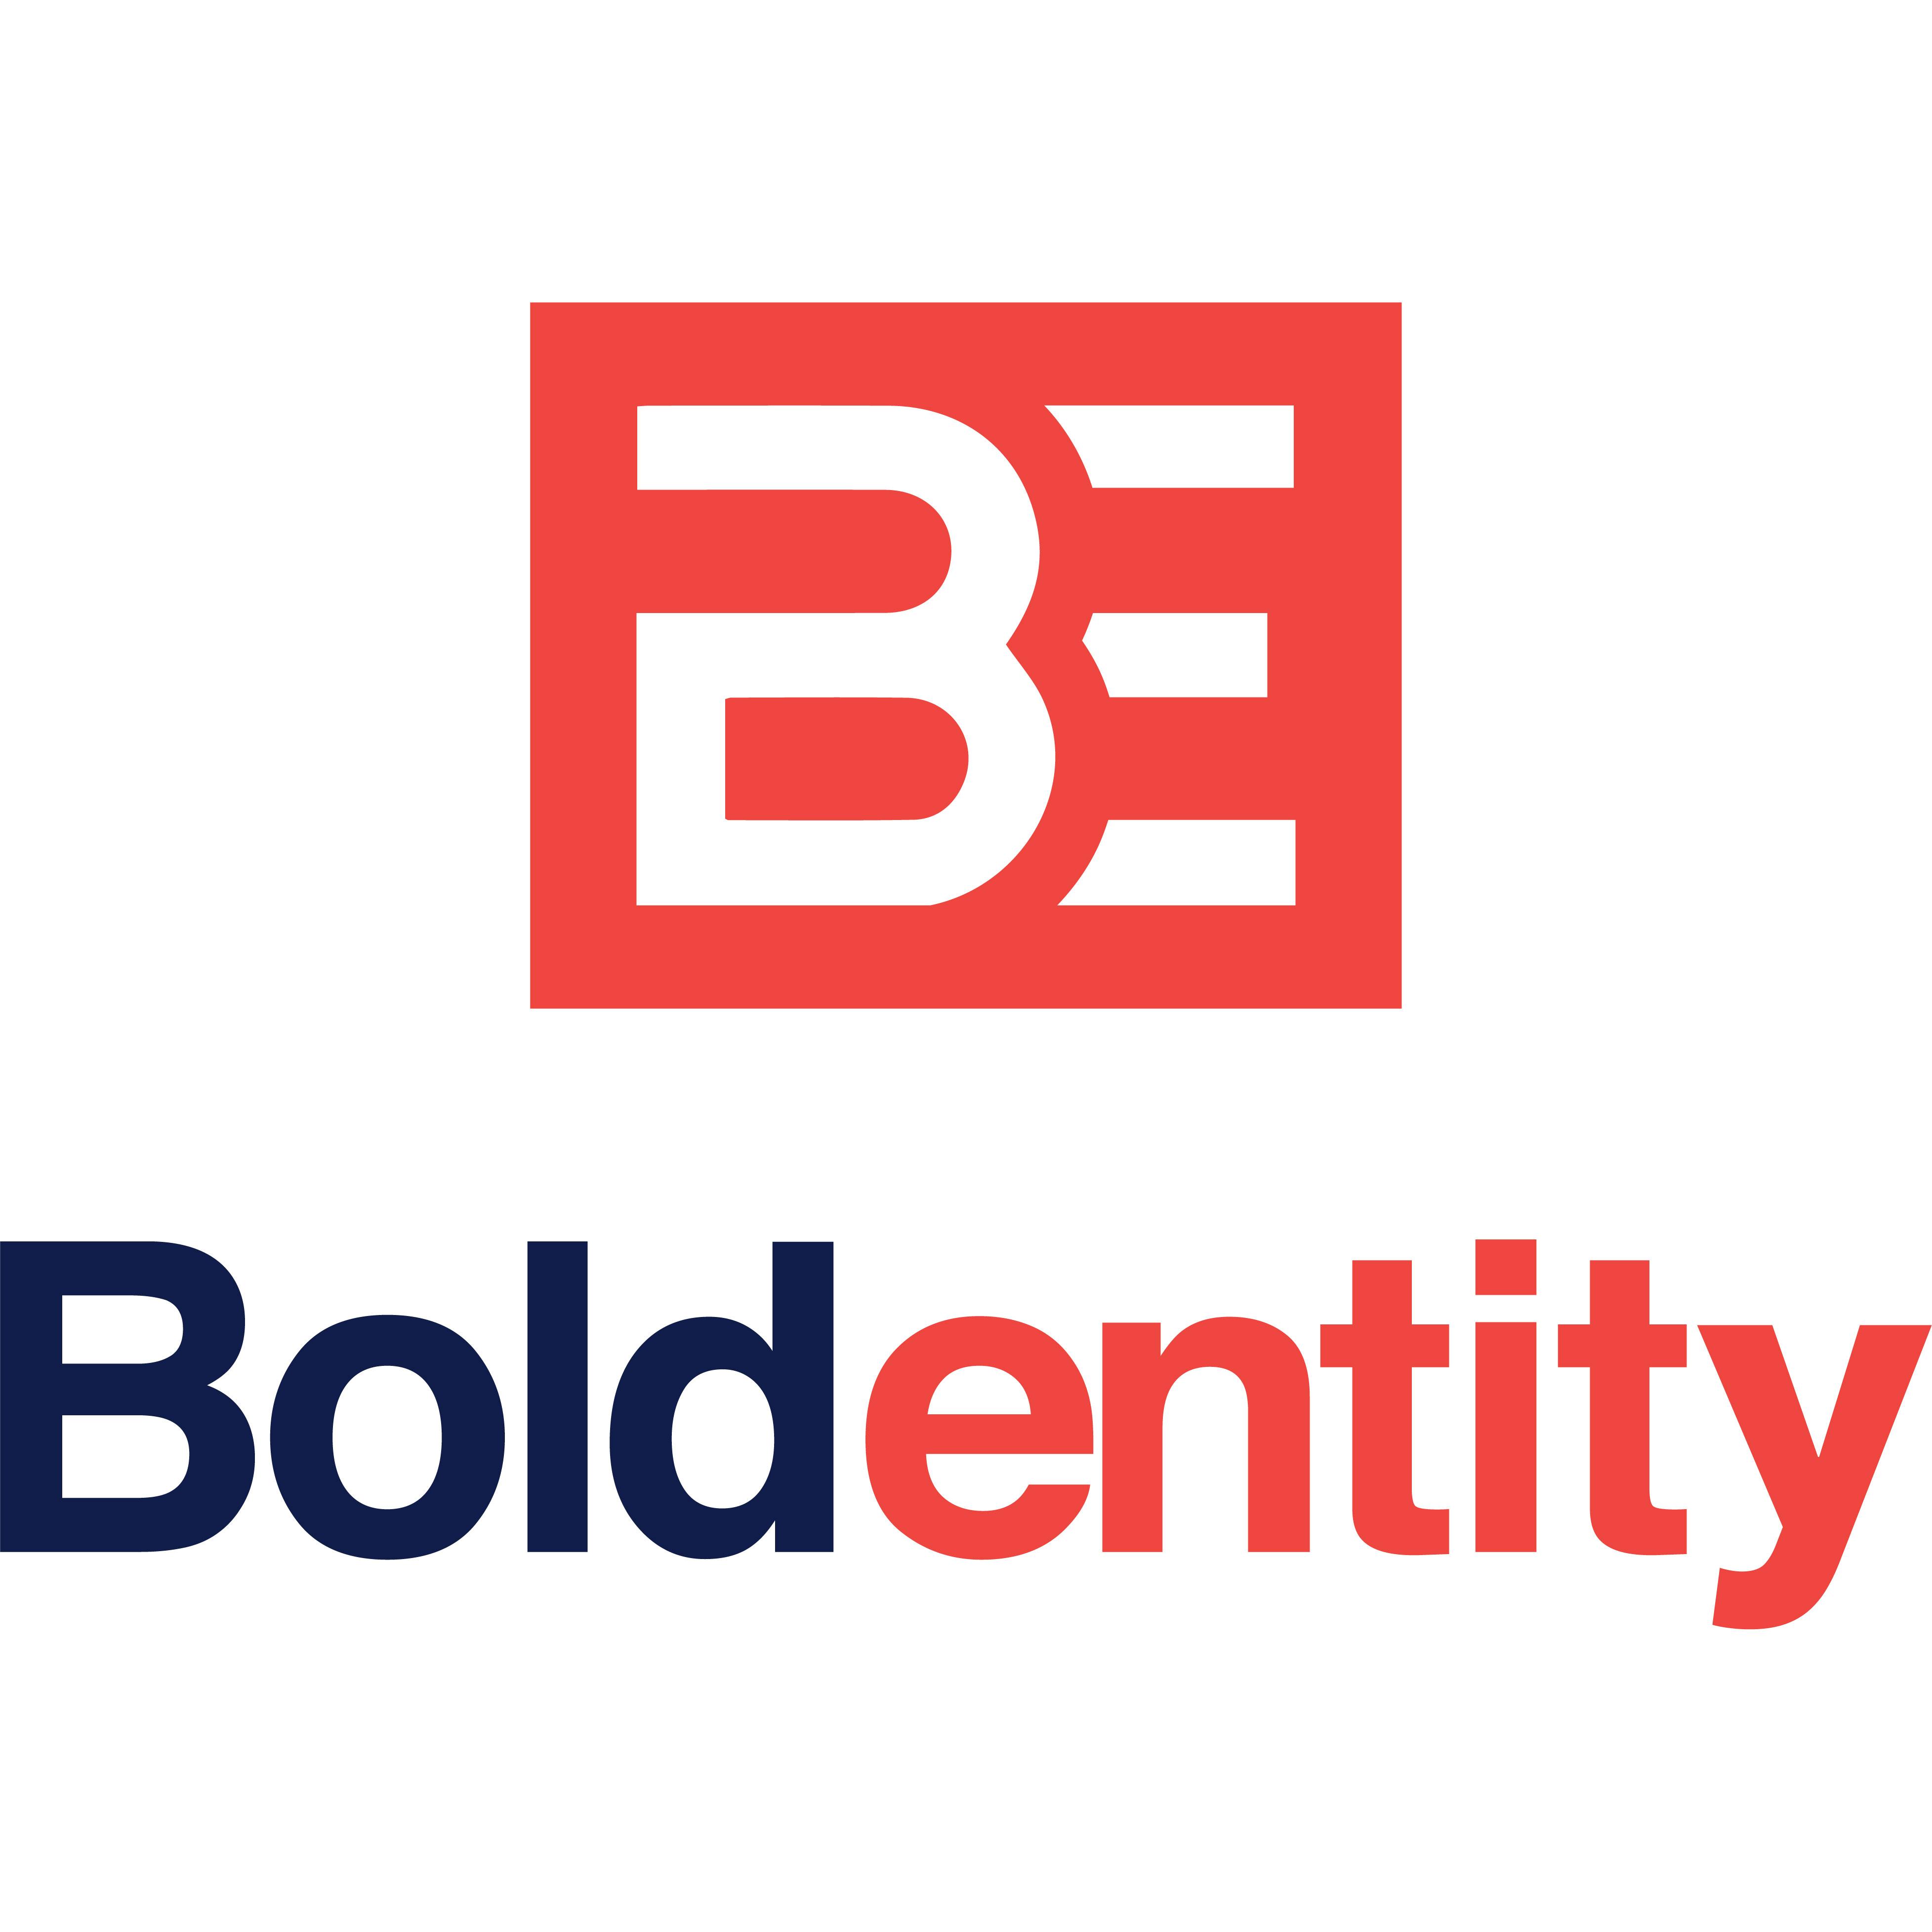 Bold Entity Logo